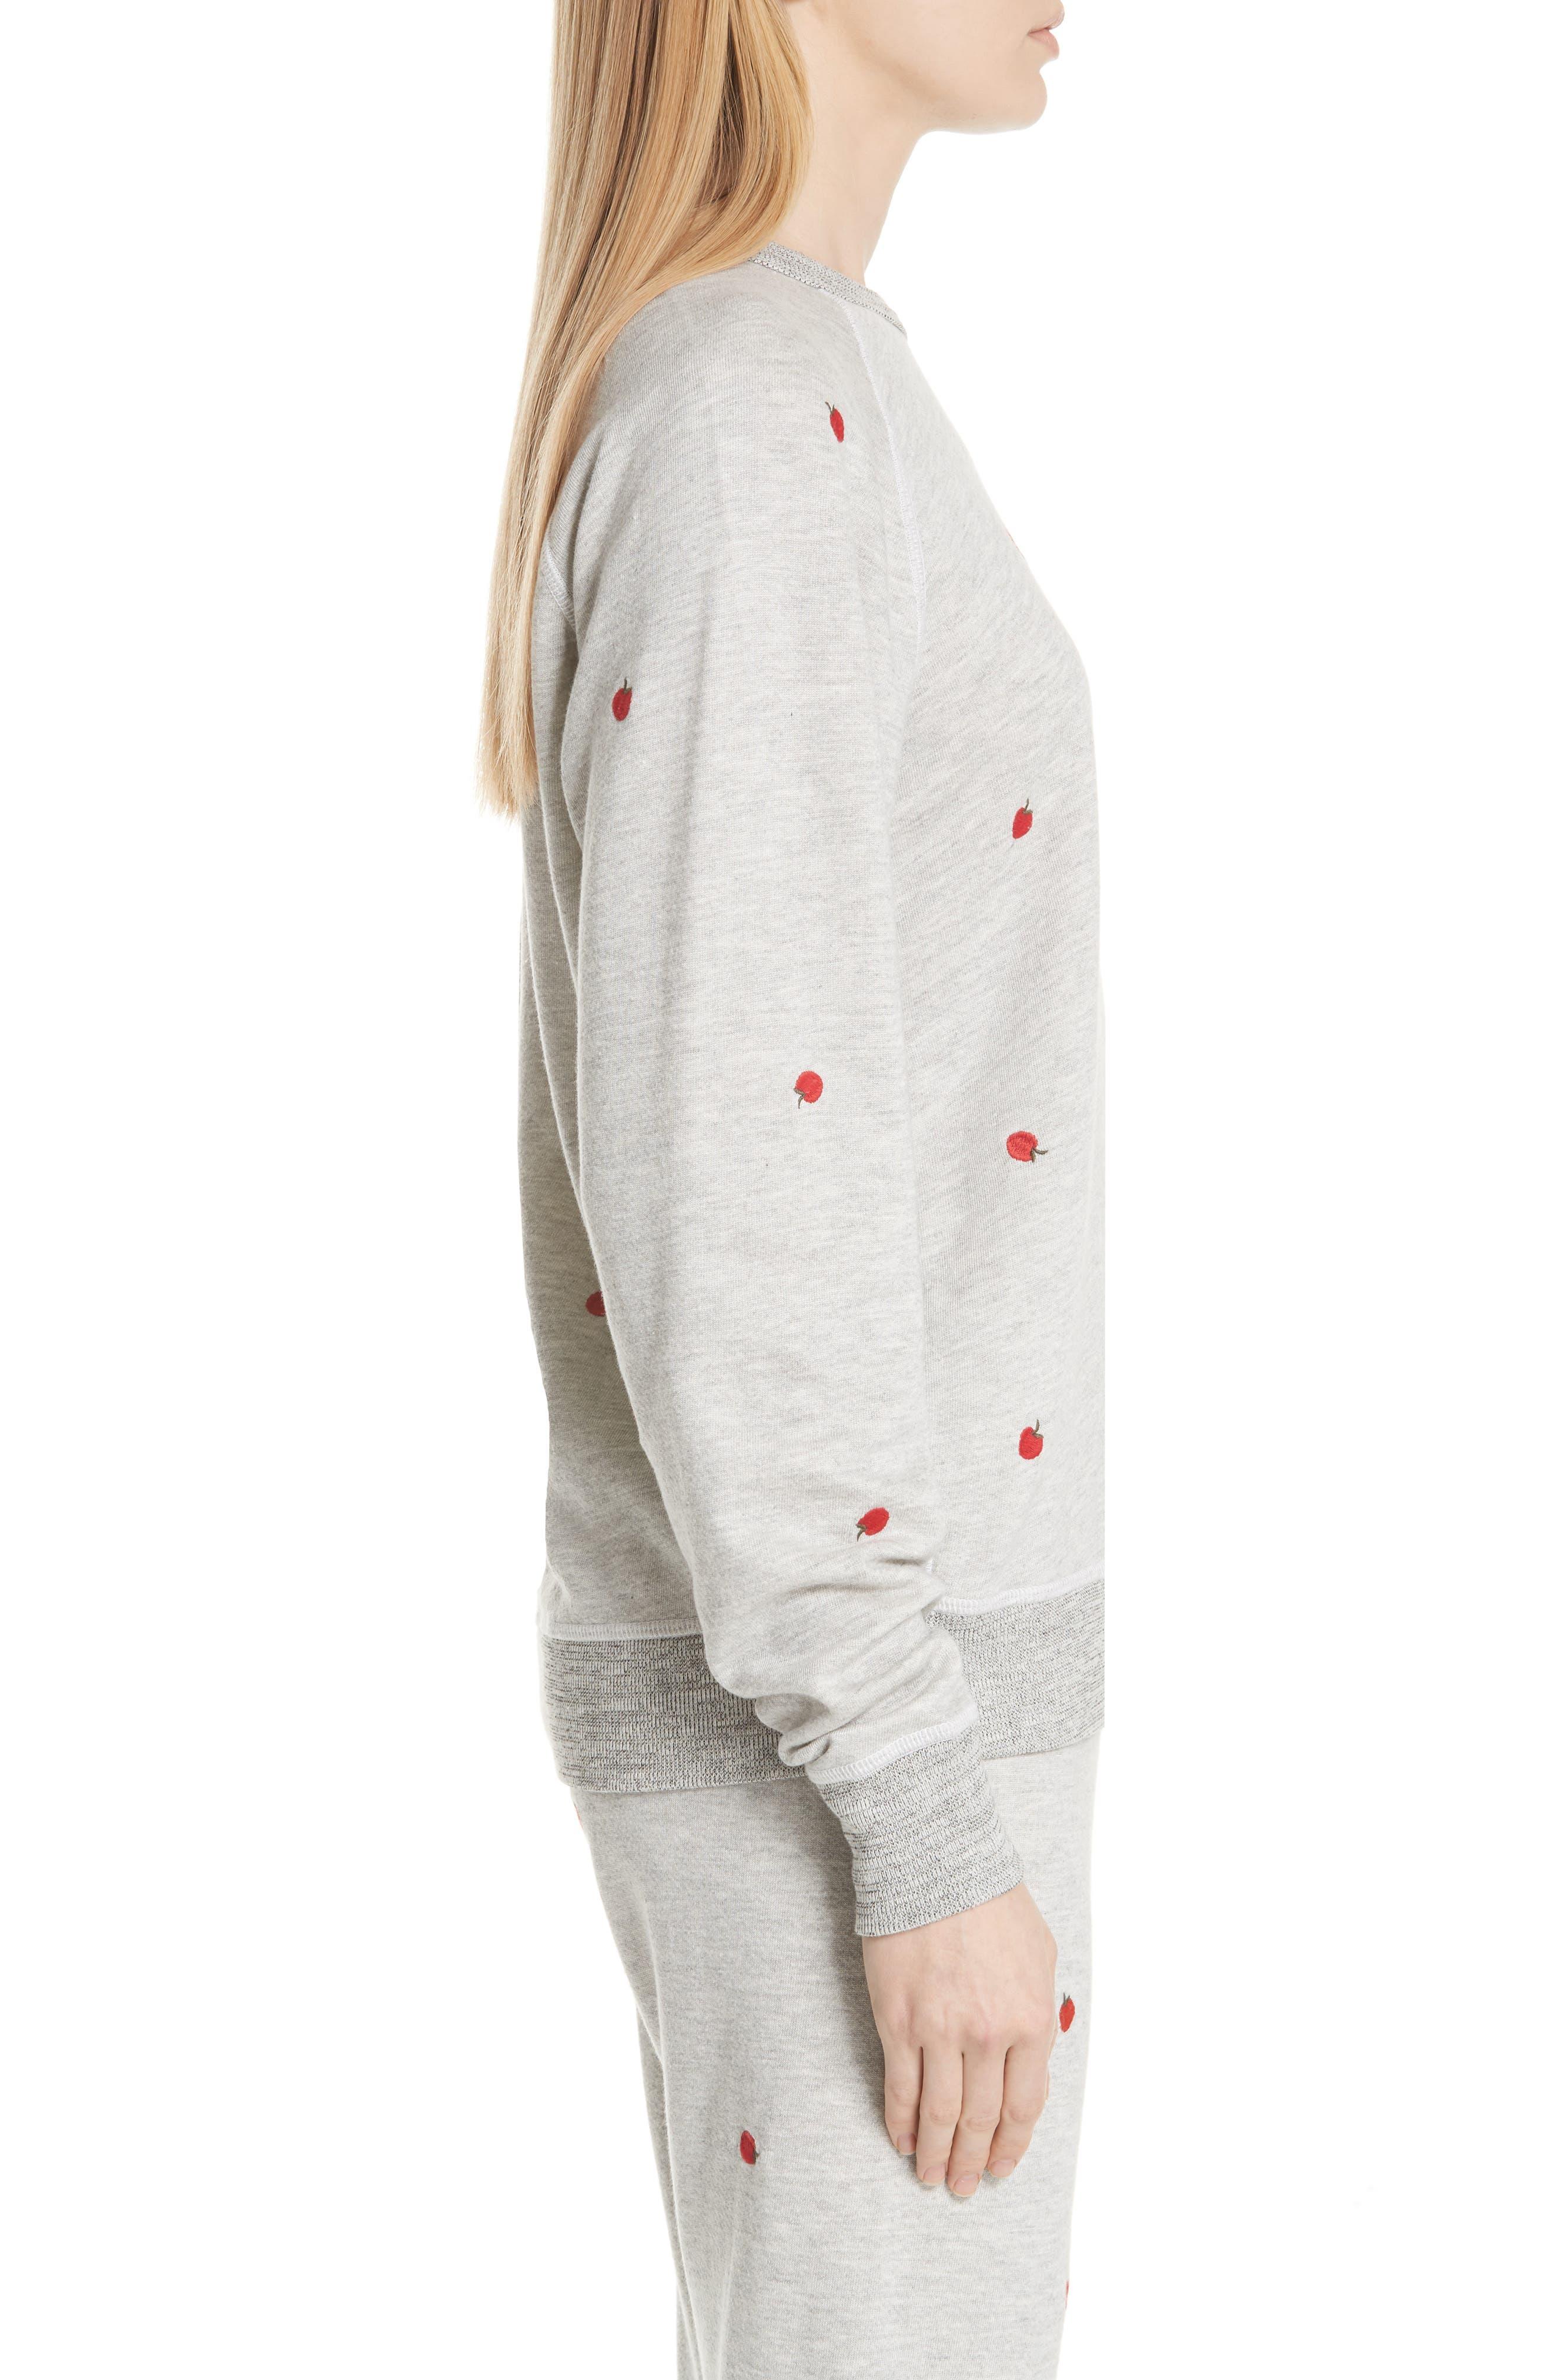 College Sweatshirt,                             Alternate thumbnail 3, color,                             Light Heather Grey/ Red Apples